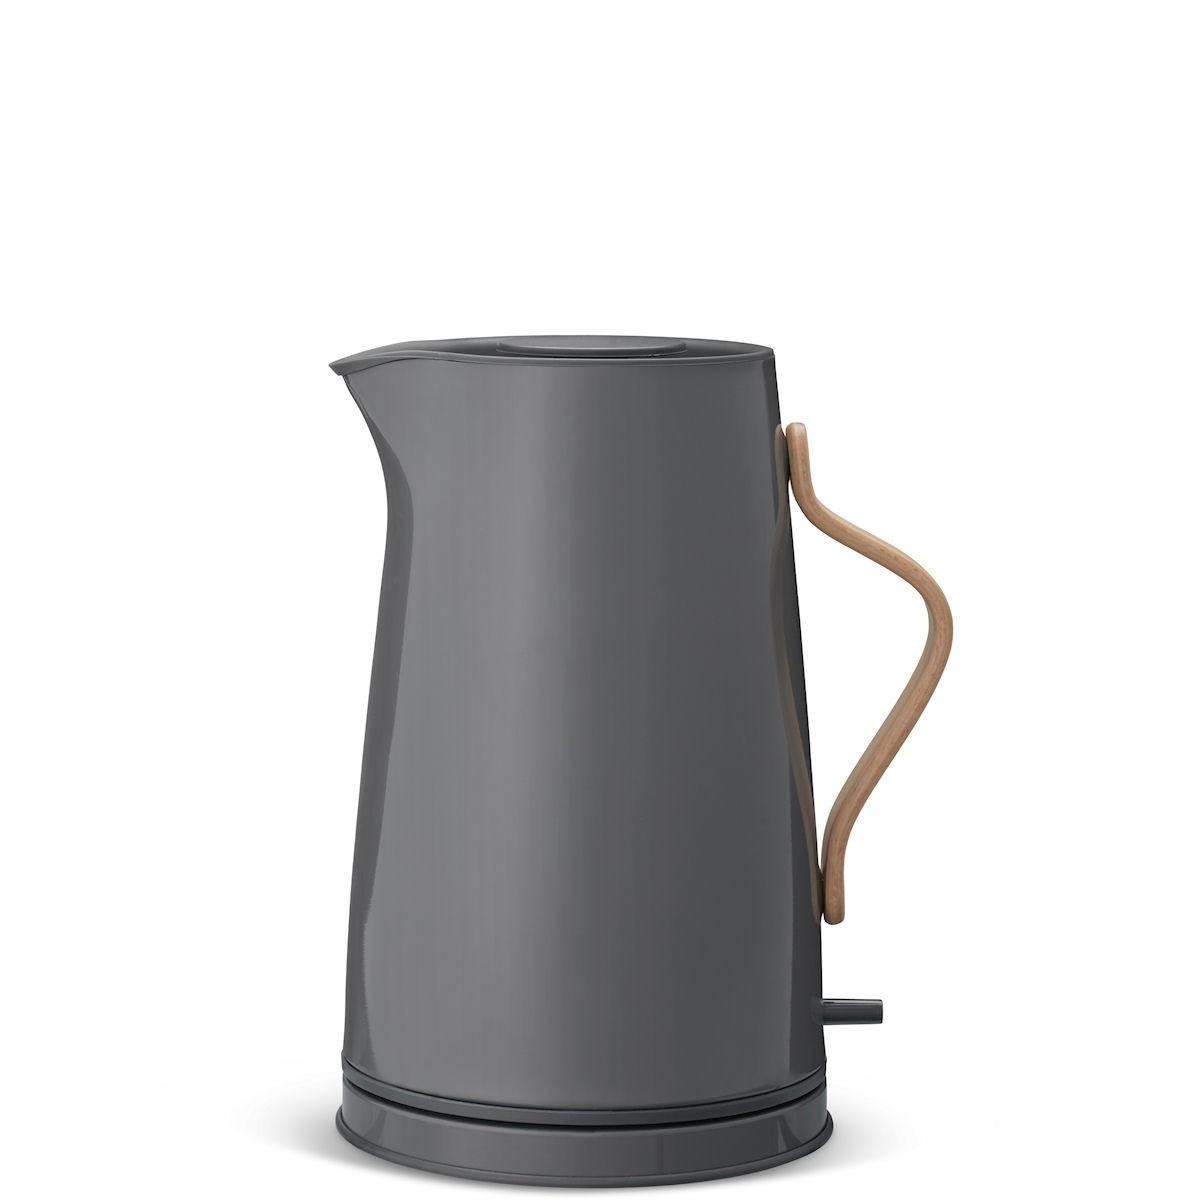 czajnik elektryczny stelton emma x 210 1 sklep. Black Bedroom Furniture Sets. Home Design Ideas